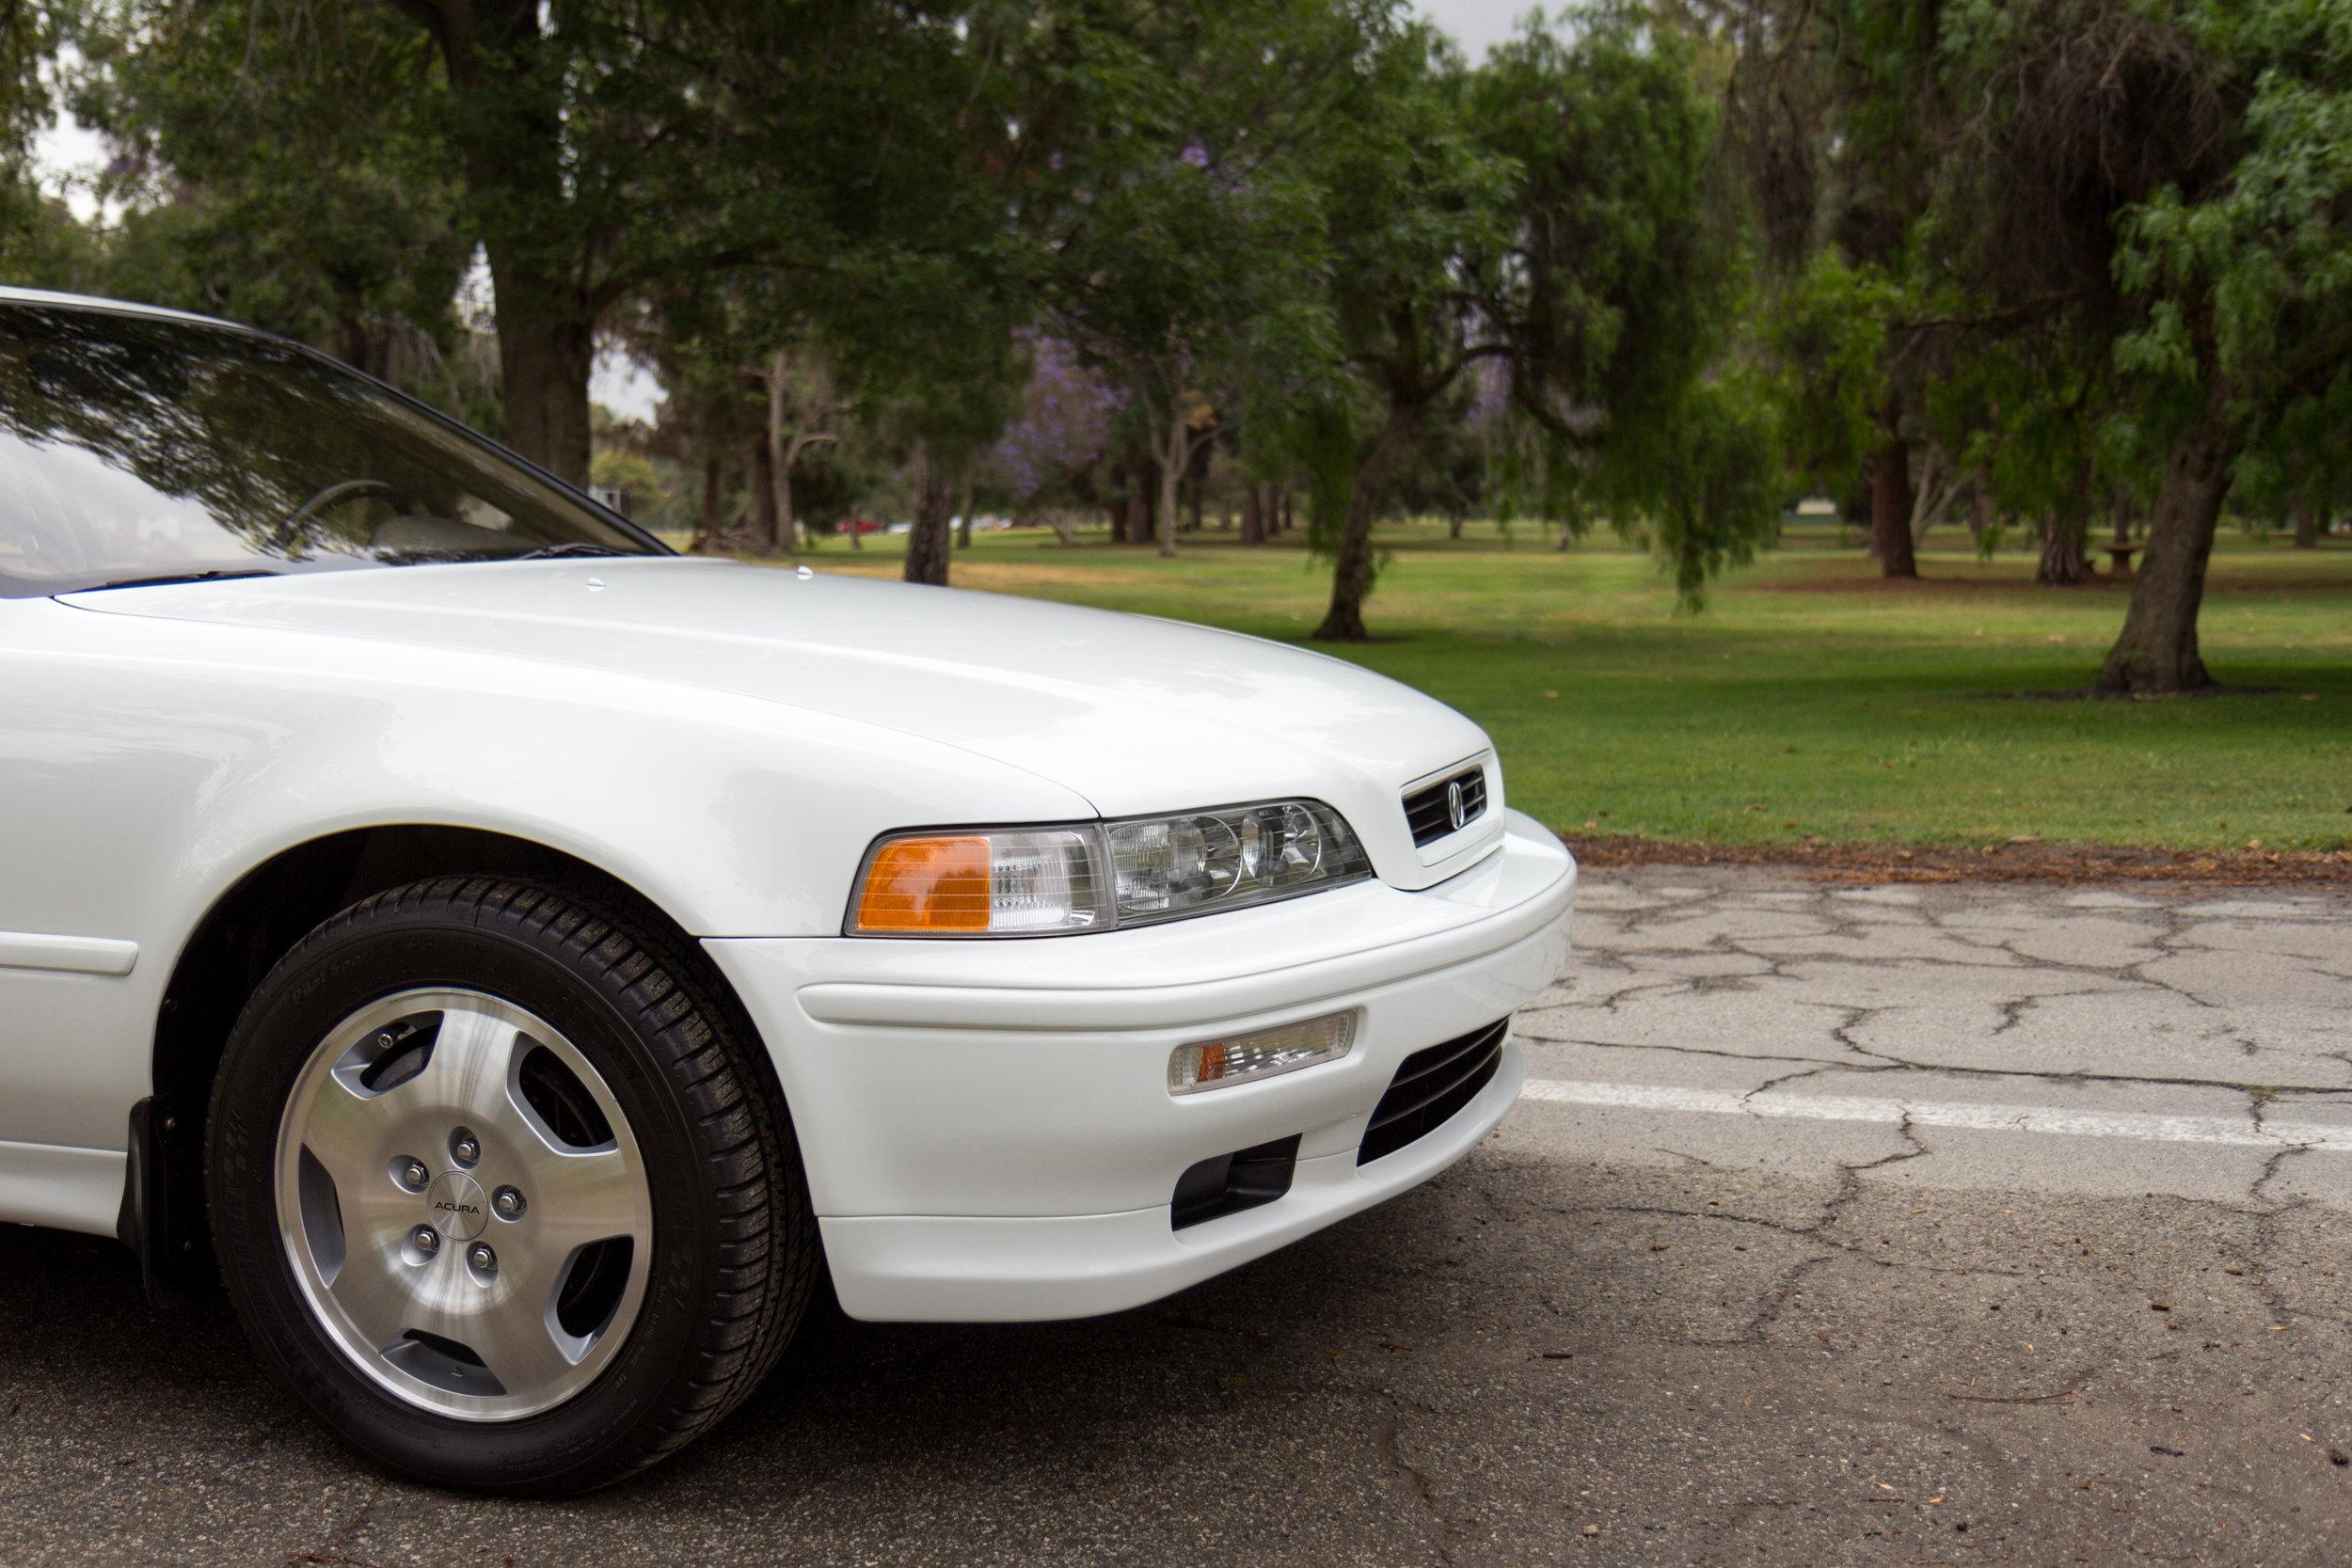 1994 Acura Legend Coupe-39.JPG